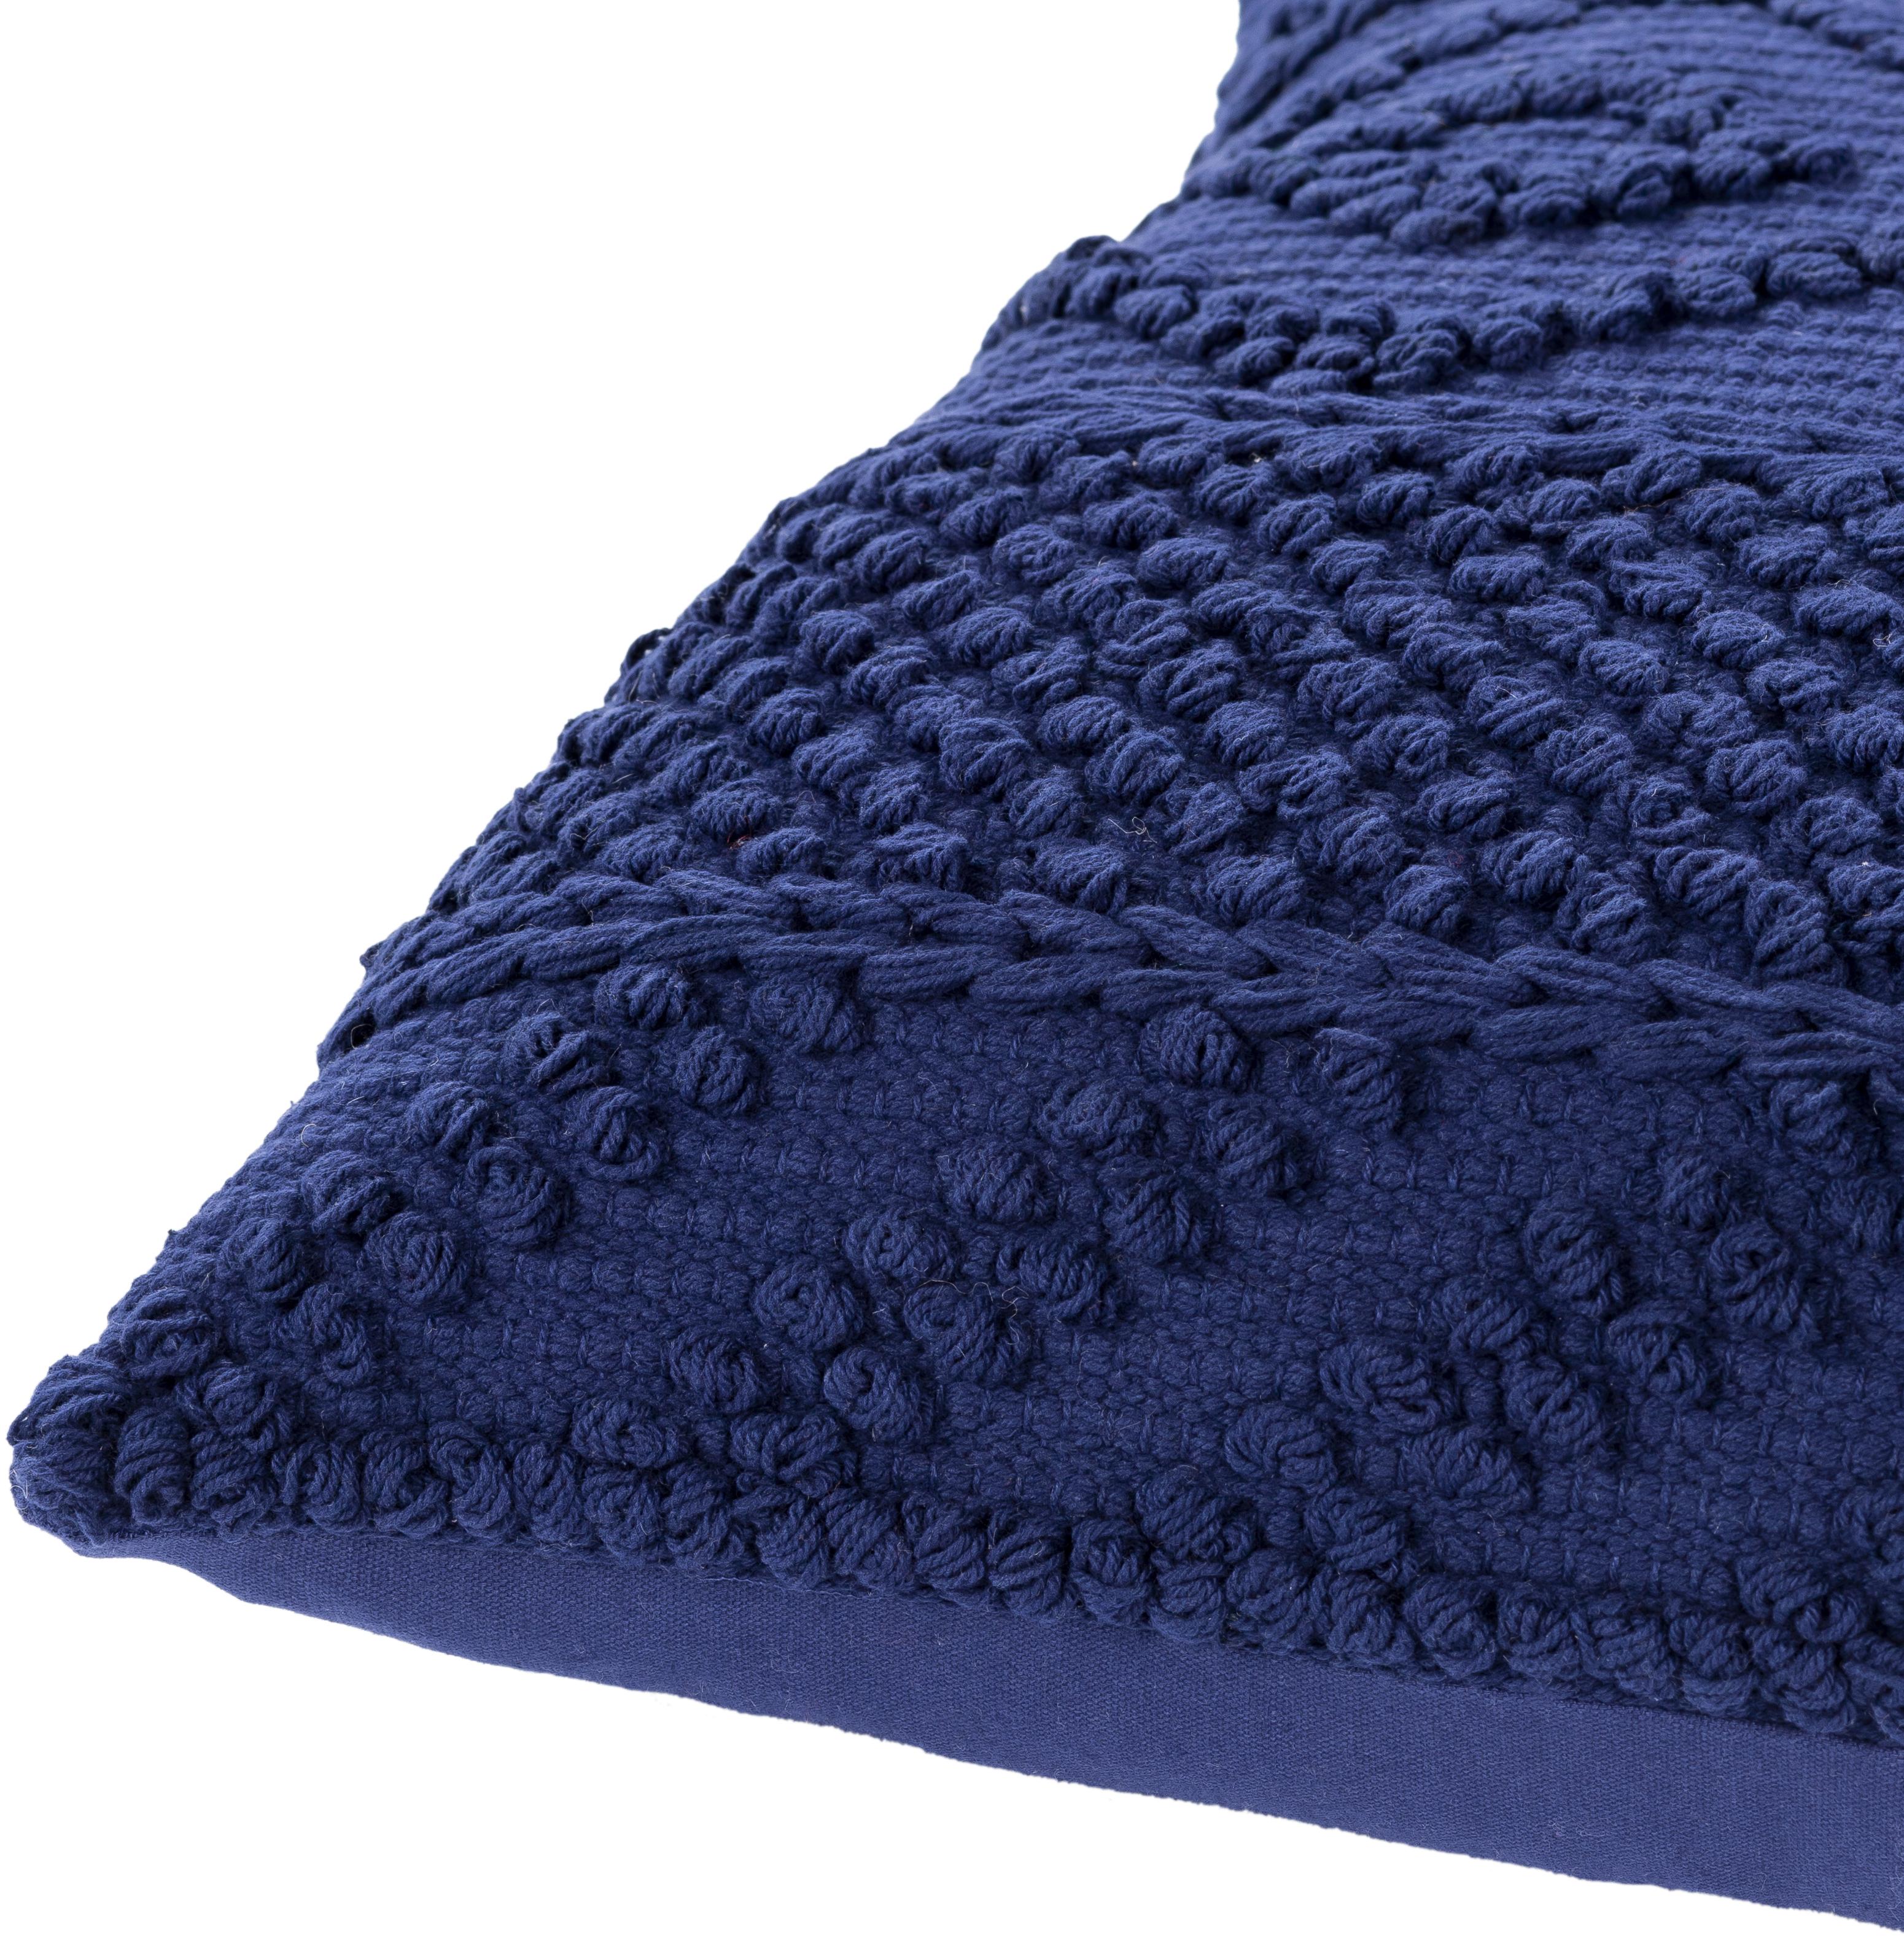 "Merdo - MDO-002 - 18"" x 18"" - pillow cover only"